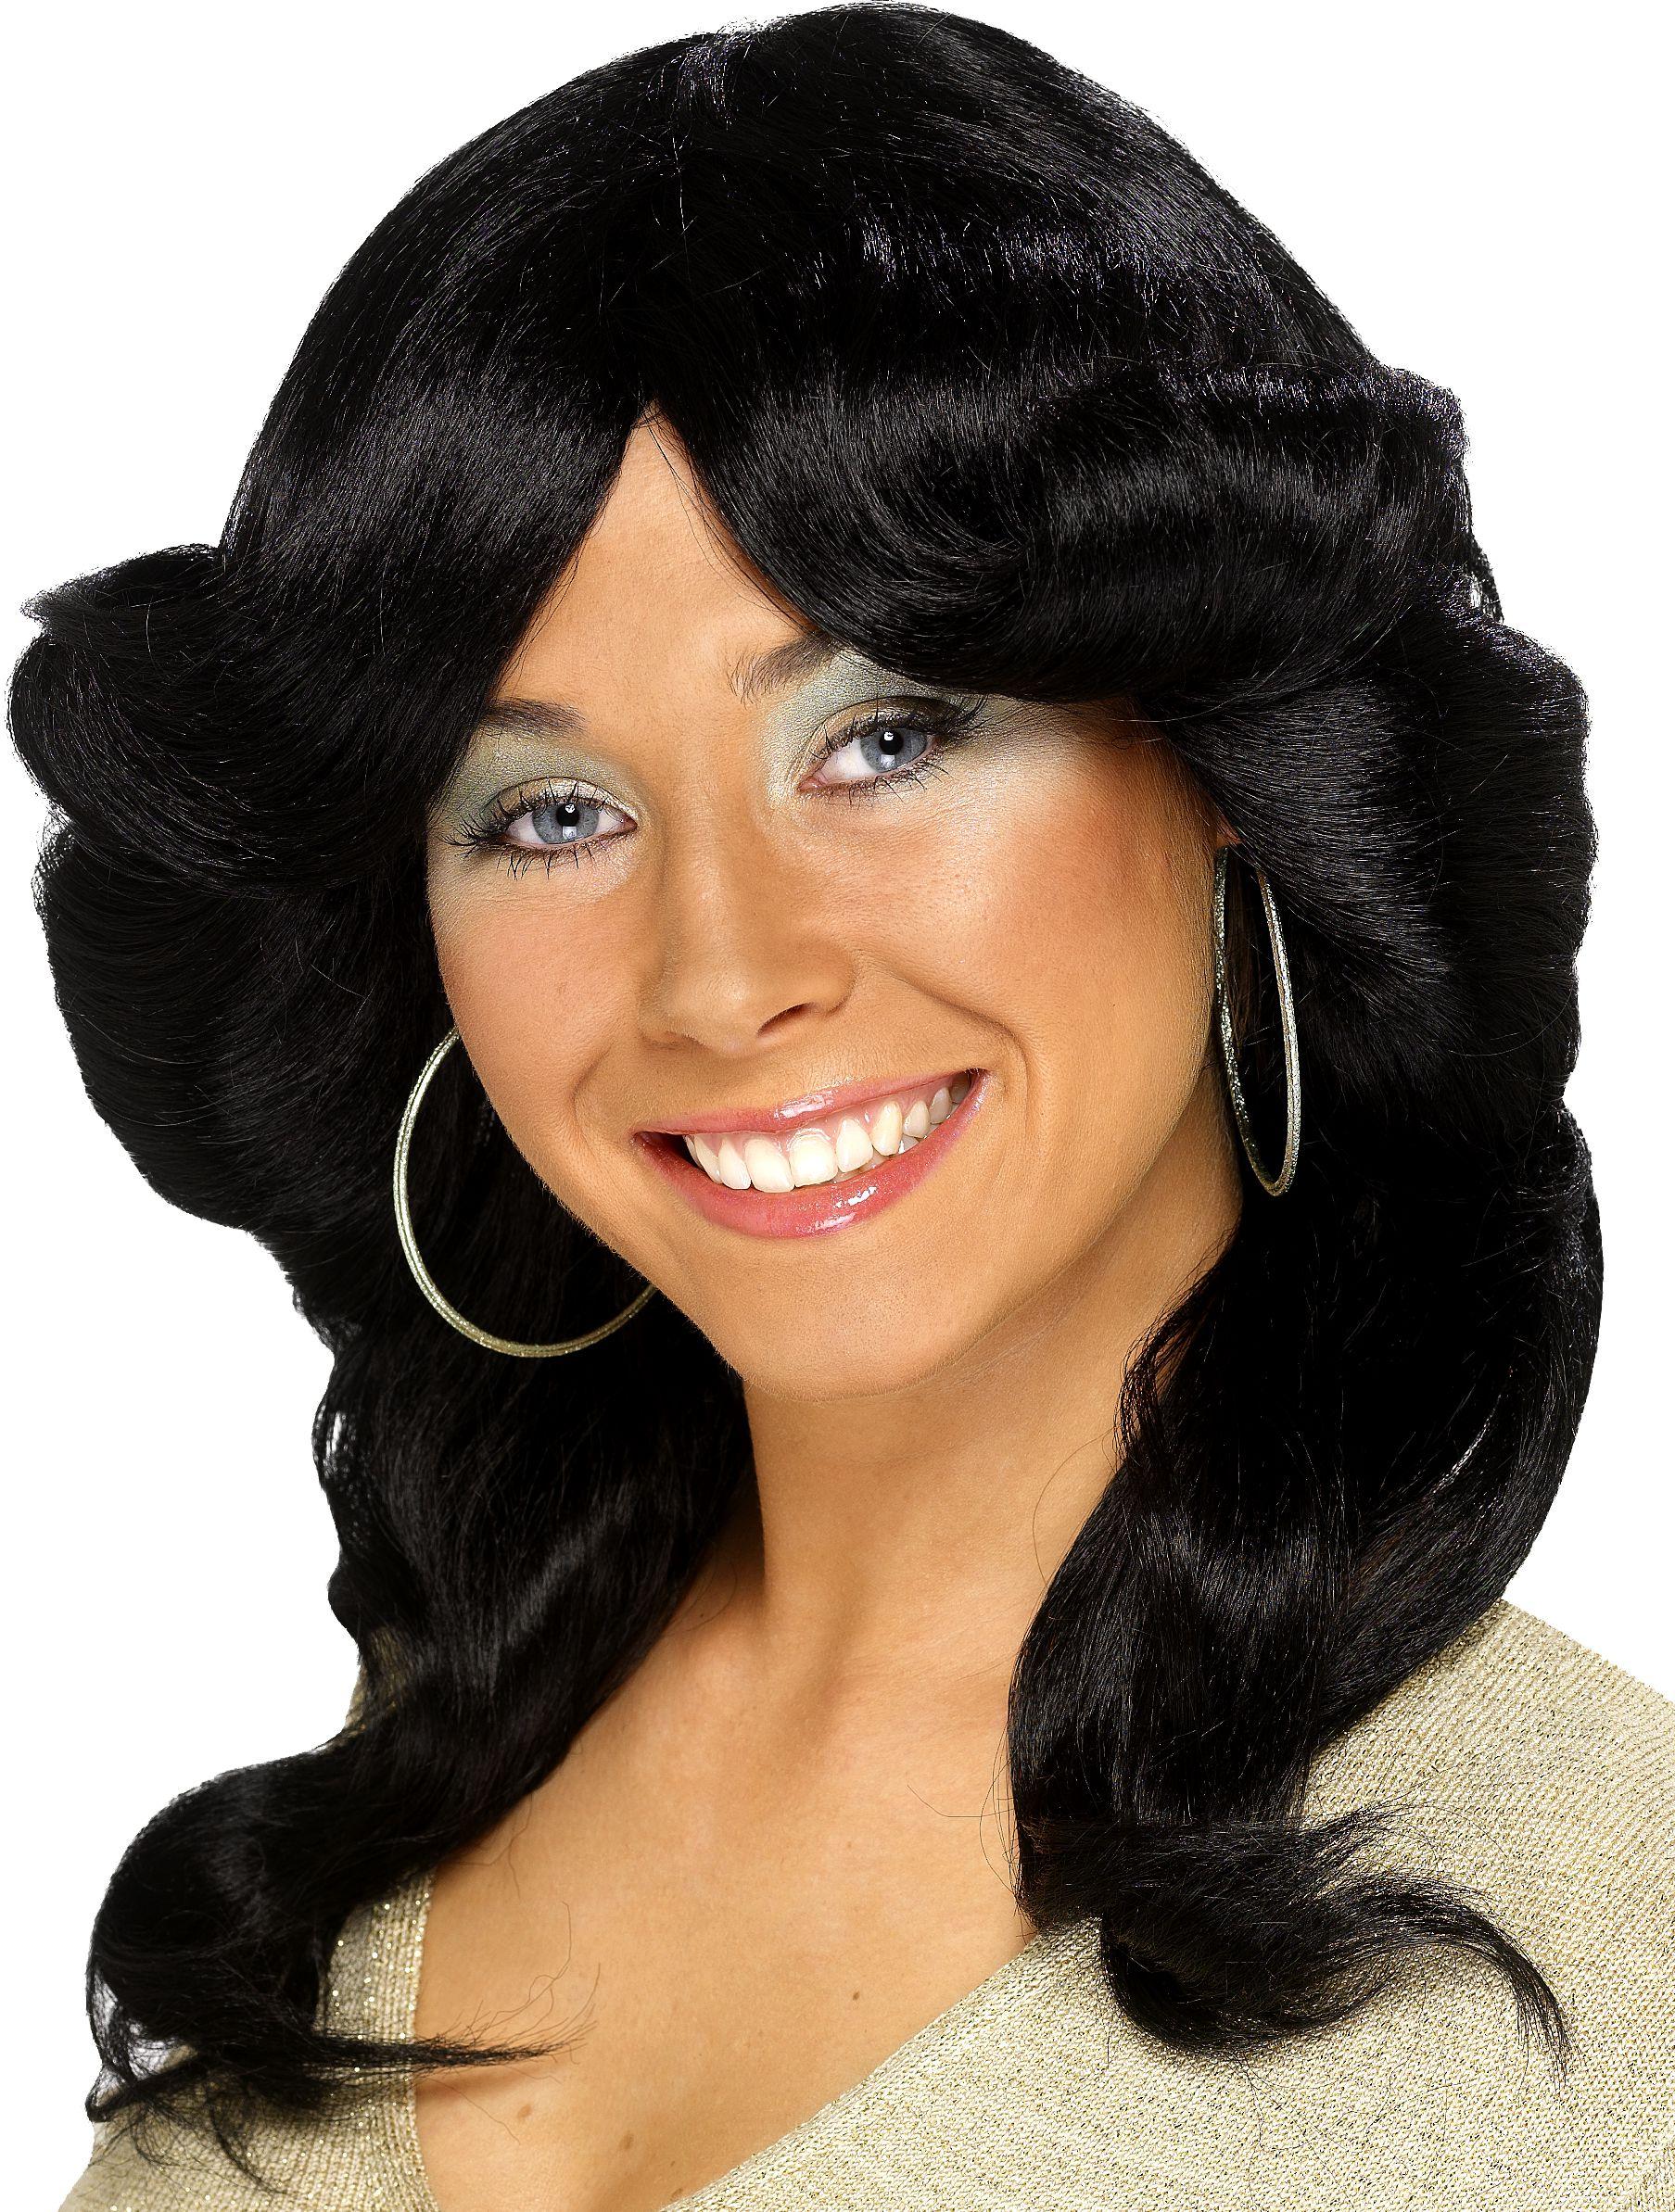 Perruque Femme Farraw Noire - Perruques Femmes